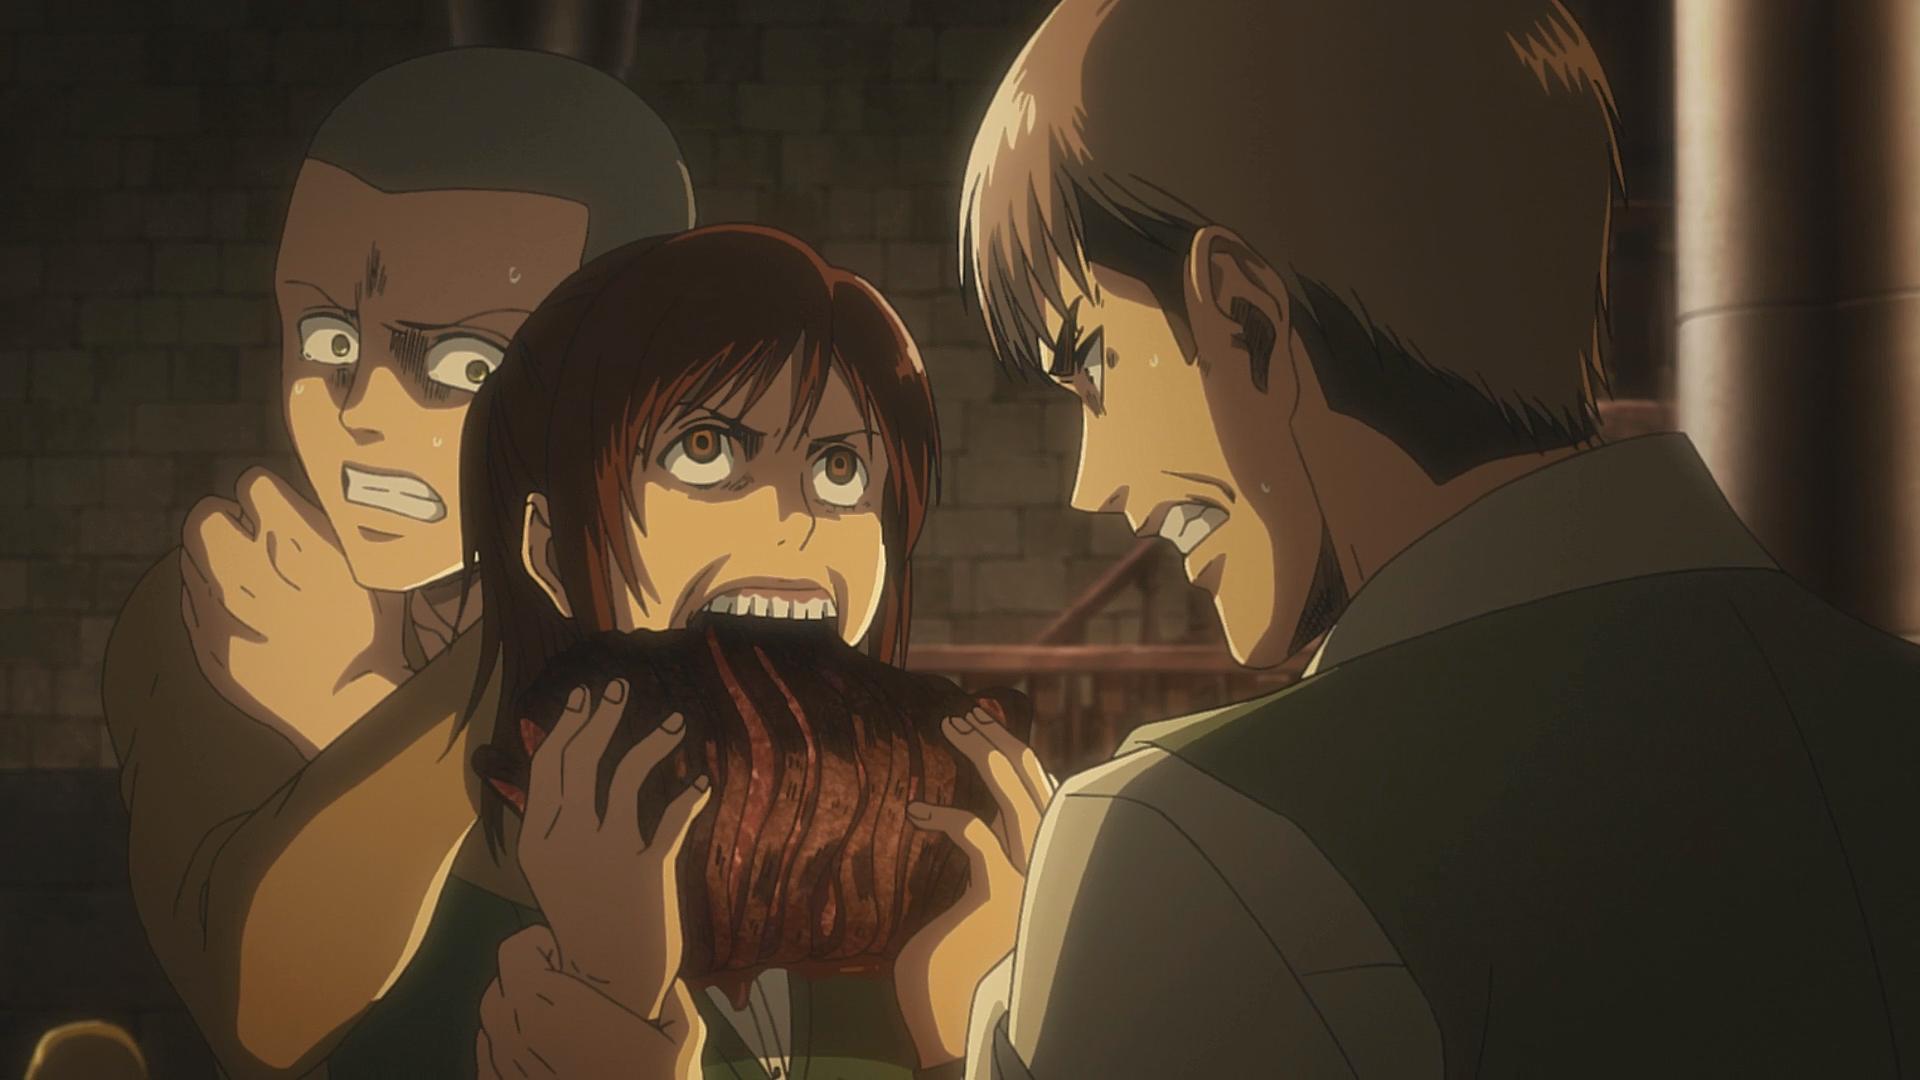 Sasha Braus Anime Attack On Titan Wiki Fandom